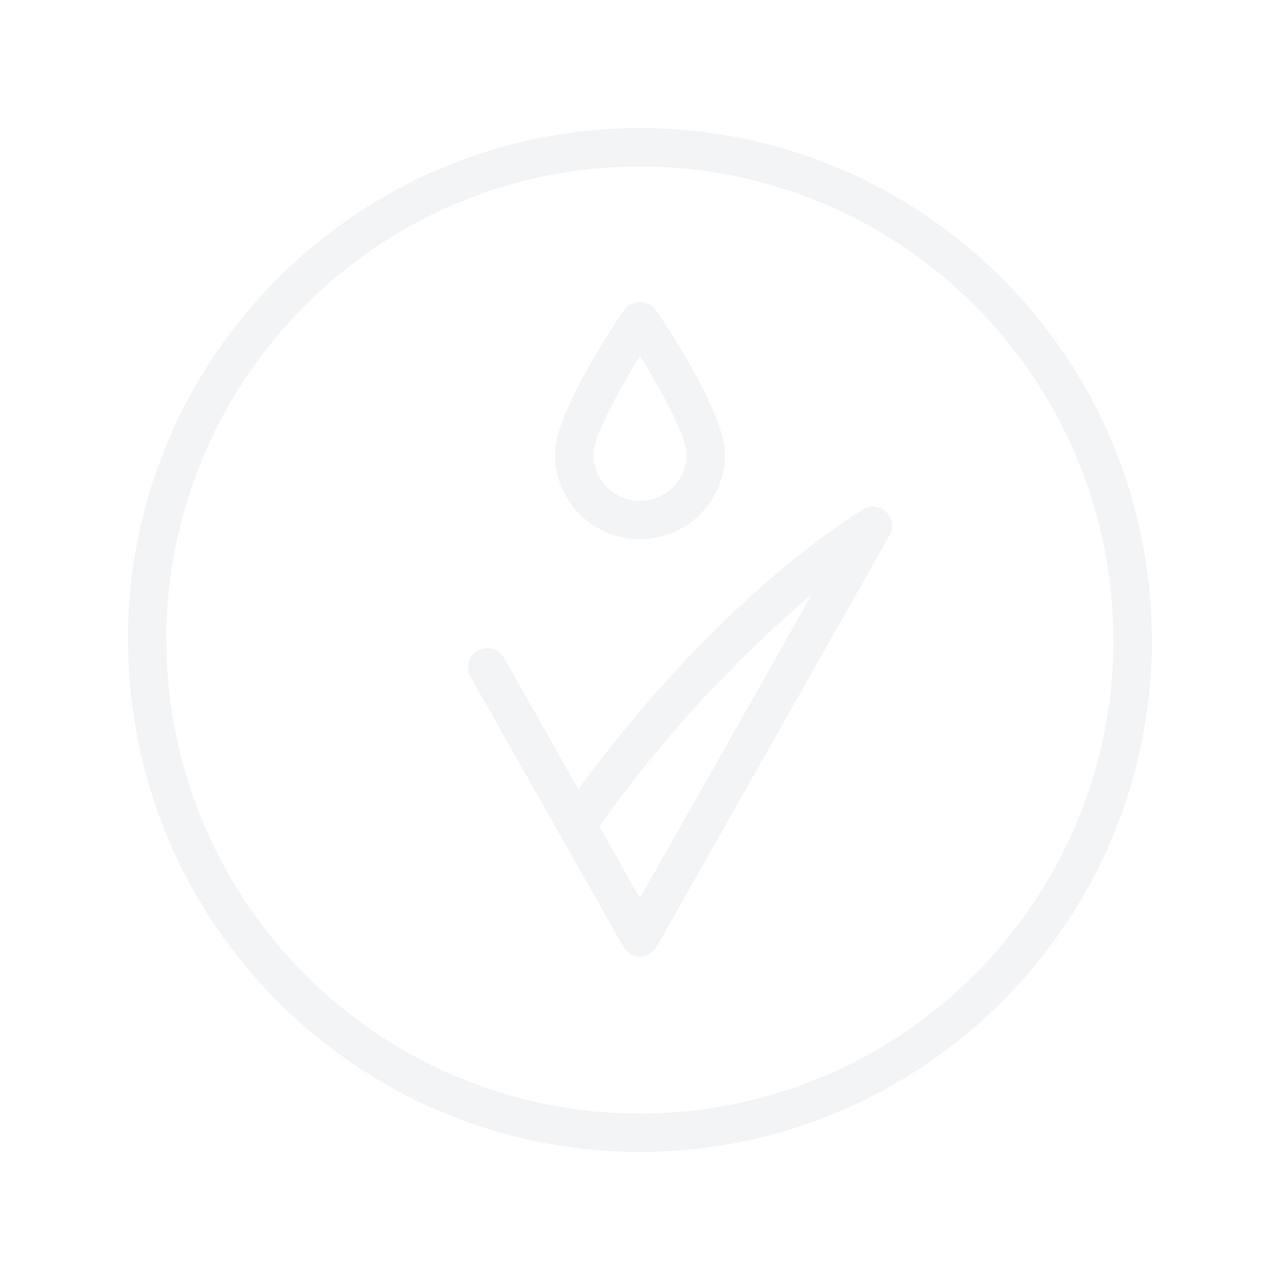 JOIK ORGANIC Lemon & Geranium Natural Mineral Roll-On Deodorant 50ml